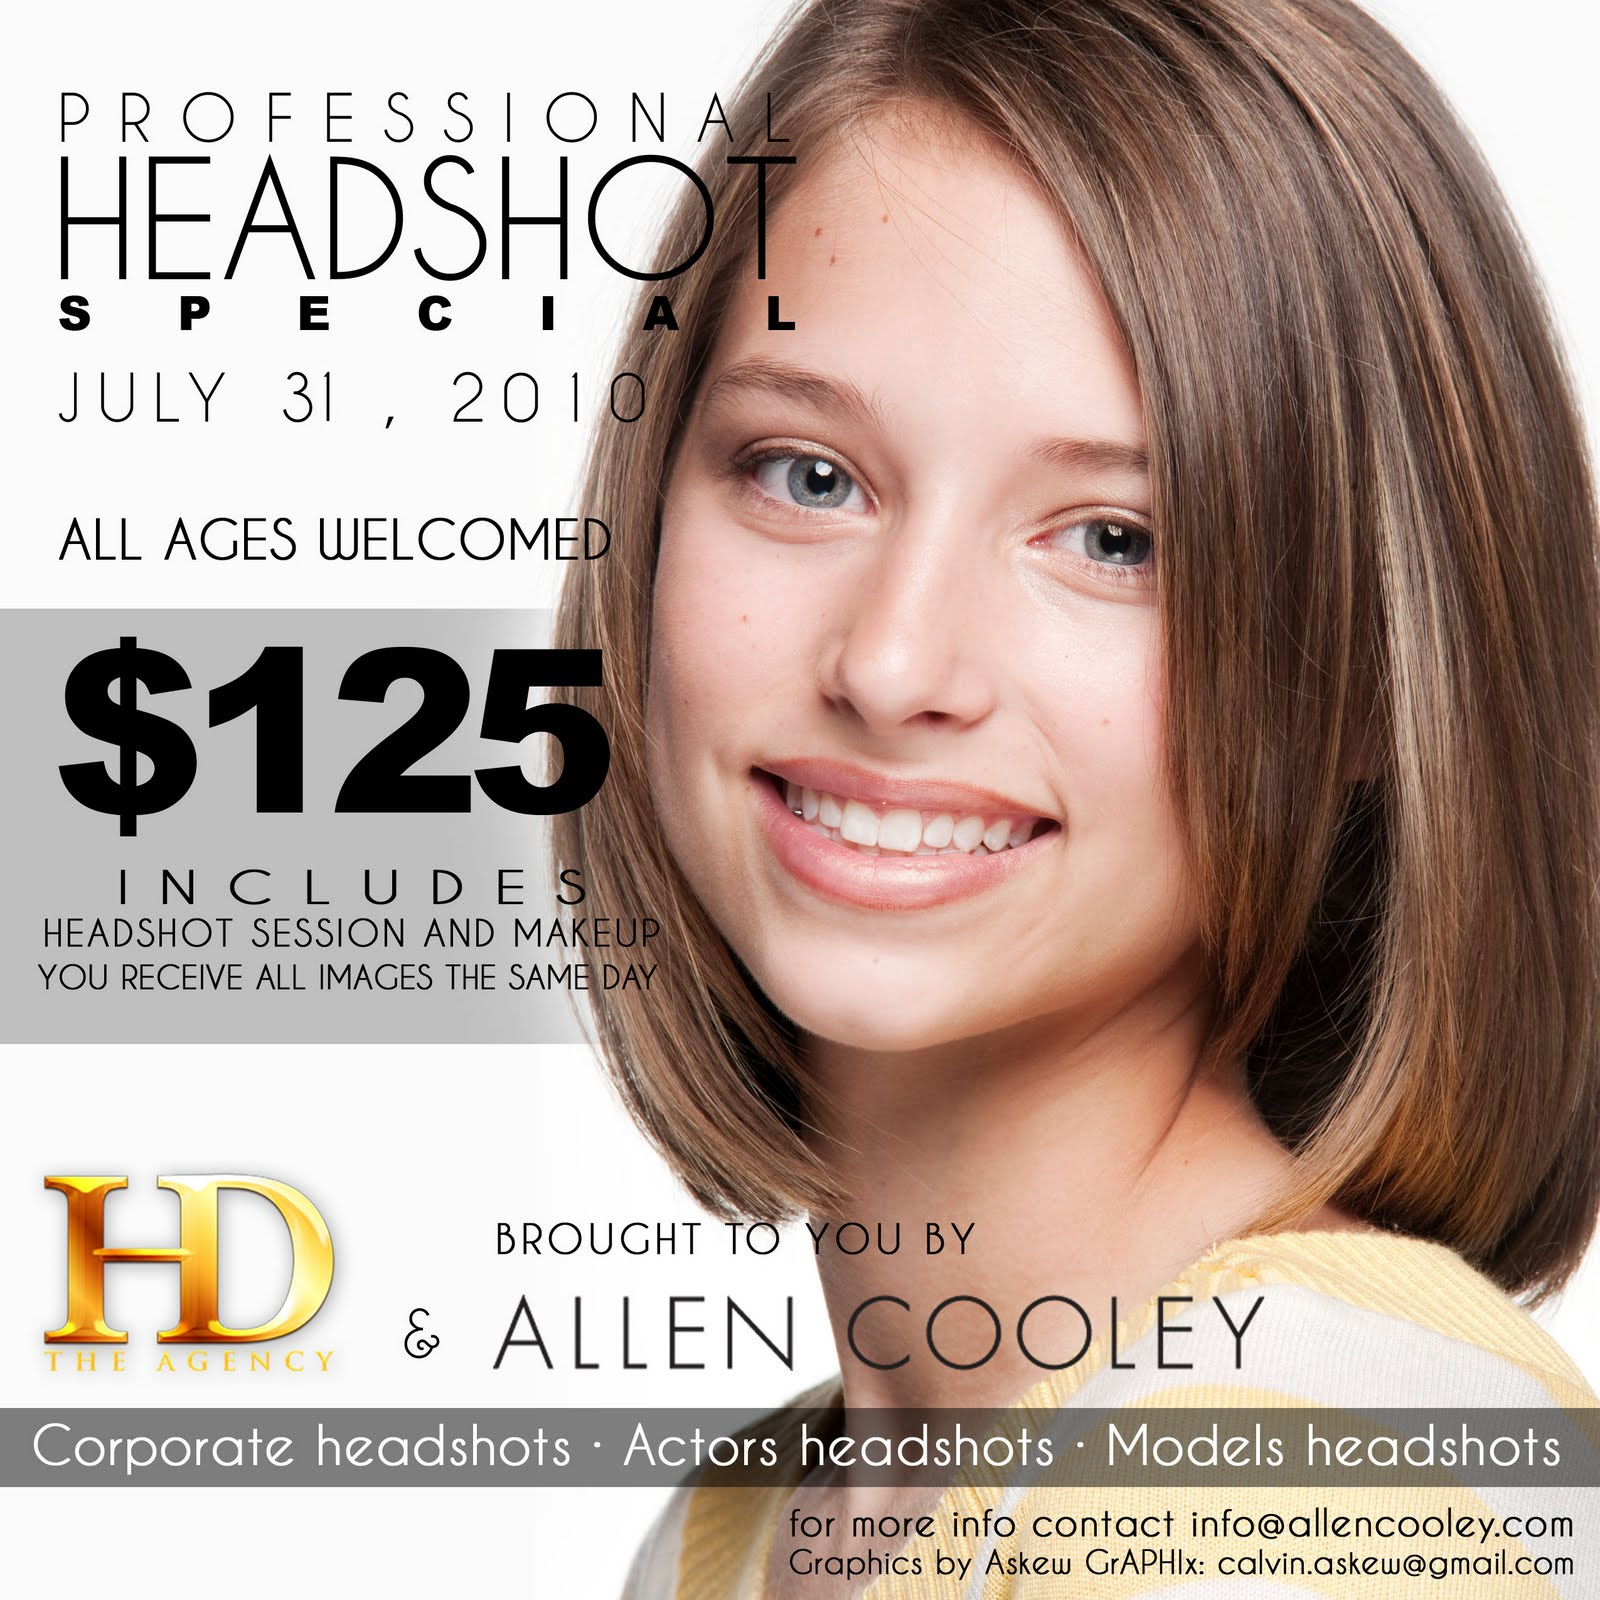 http://4.bp.blogspot.com/_ZDgejOIBaKw/TEOVDwaz9xI/AAAAAAAAAyI/GFroPAfP3PY/s1600/Knalige+Headshots+copy.jpg